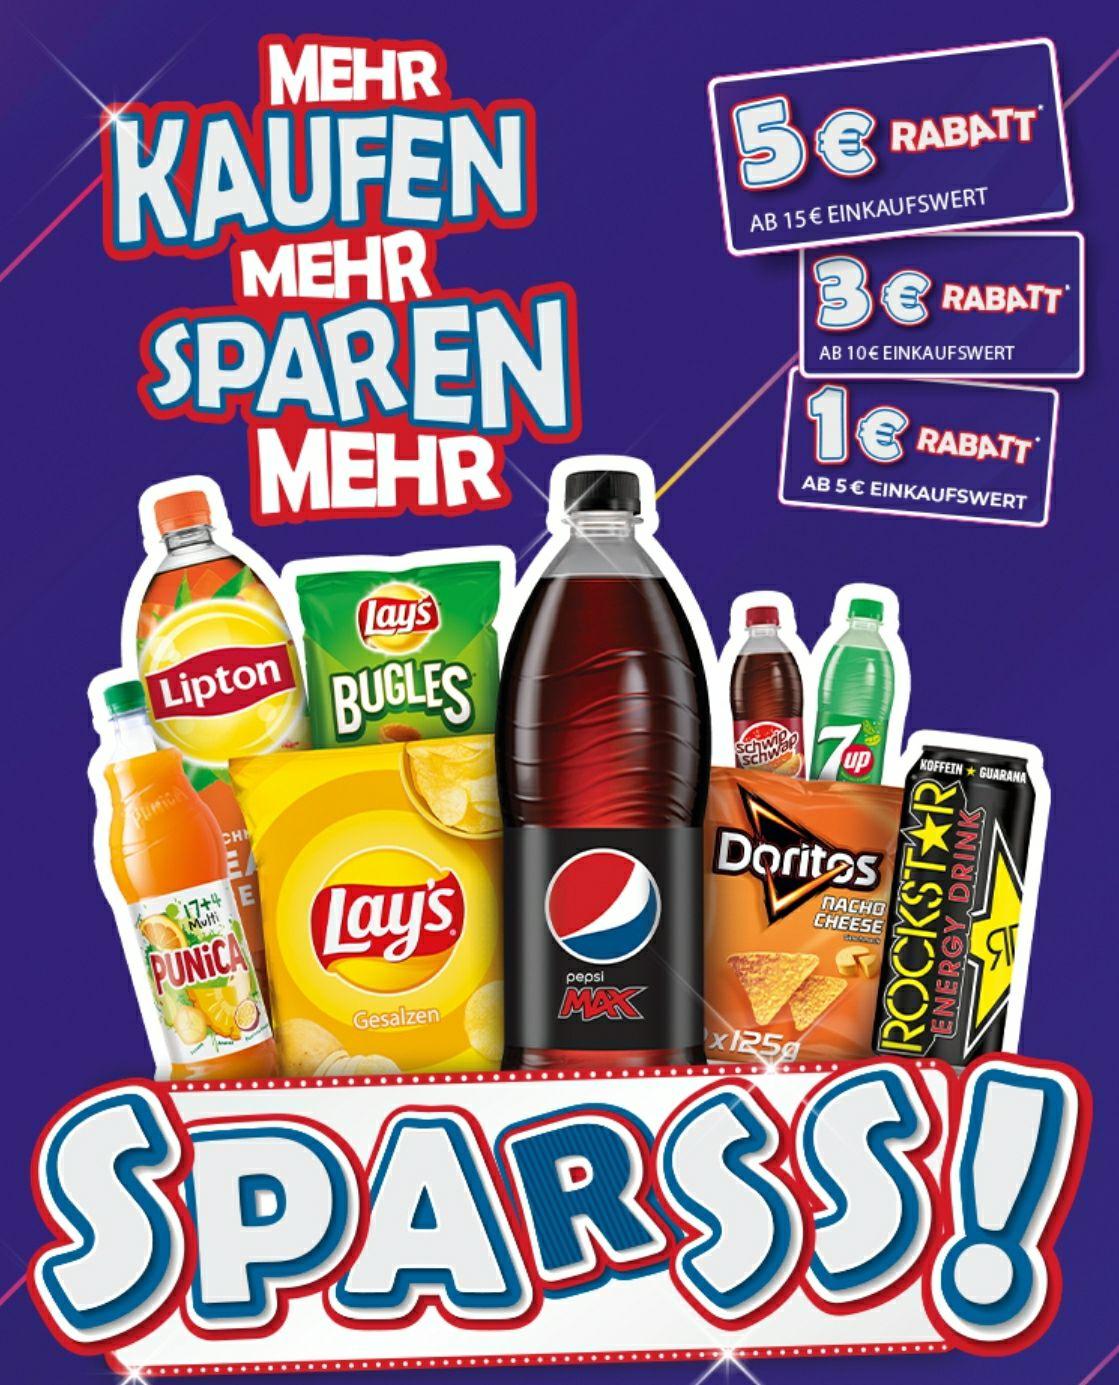 Pepsi (Rockstar, Doritos, Lays, Lipton, etc.) Aktion bis zu 5€ Sofort-Rabatt (1€/5€   3€/10€   5€/15€)